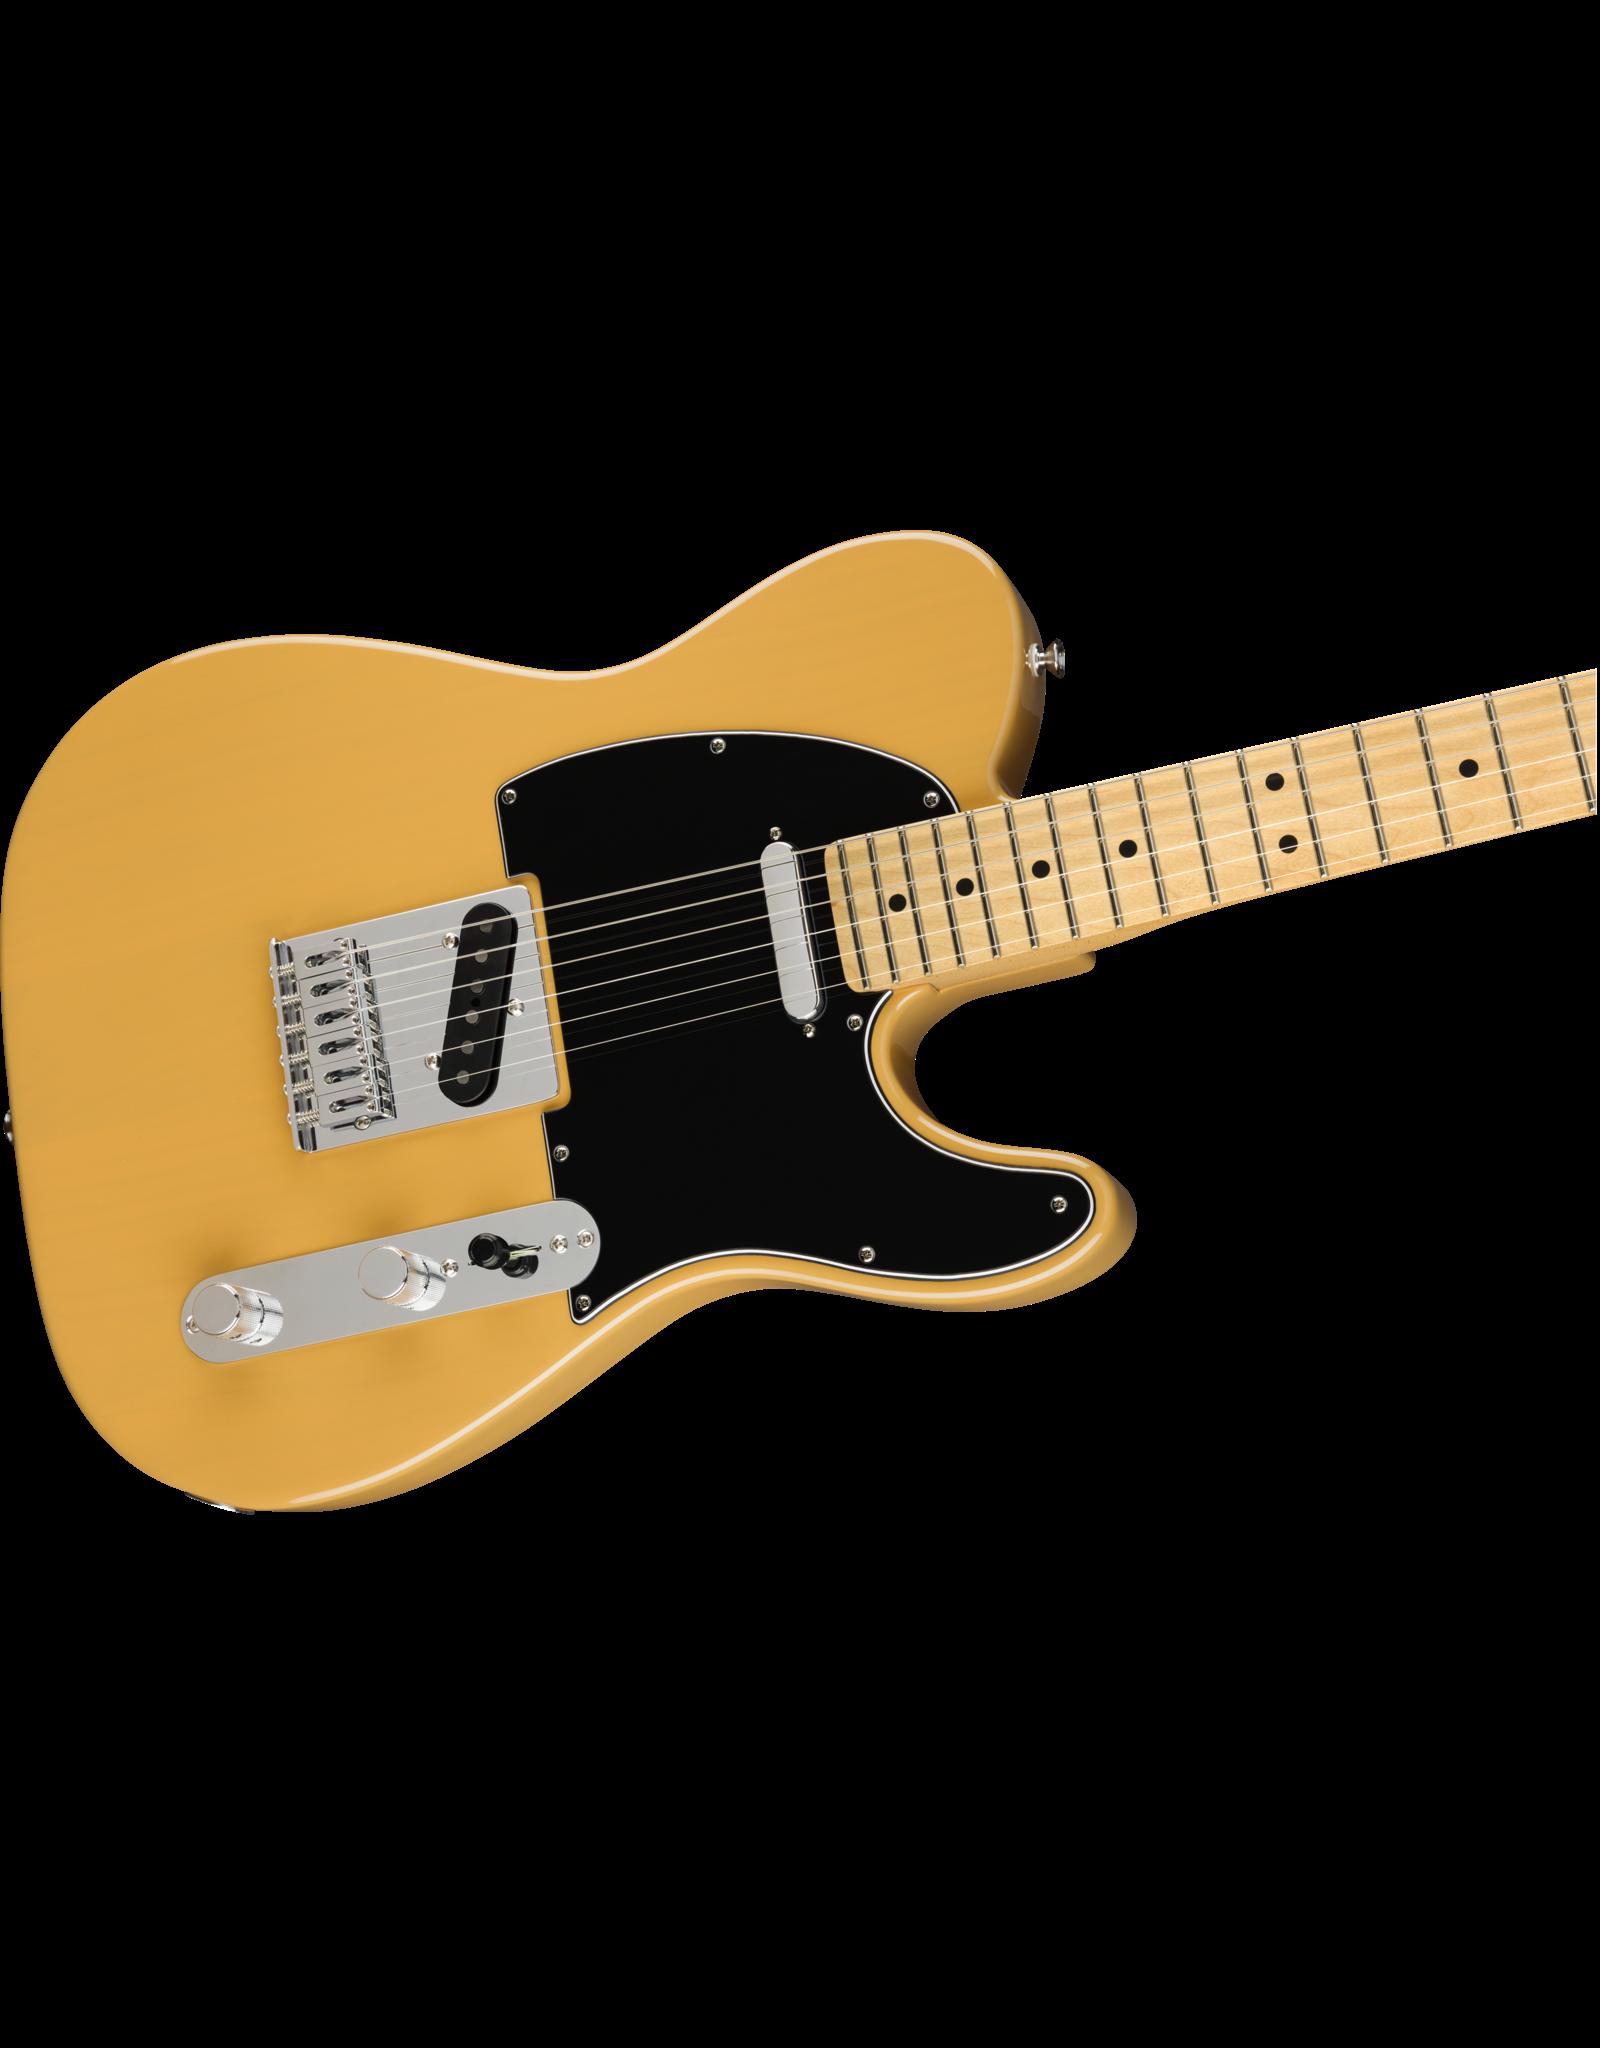 Fender Fender Player Telecaster Butterscotch Blonde Maple